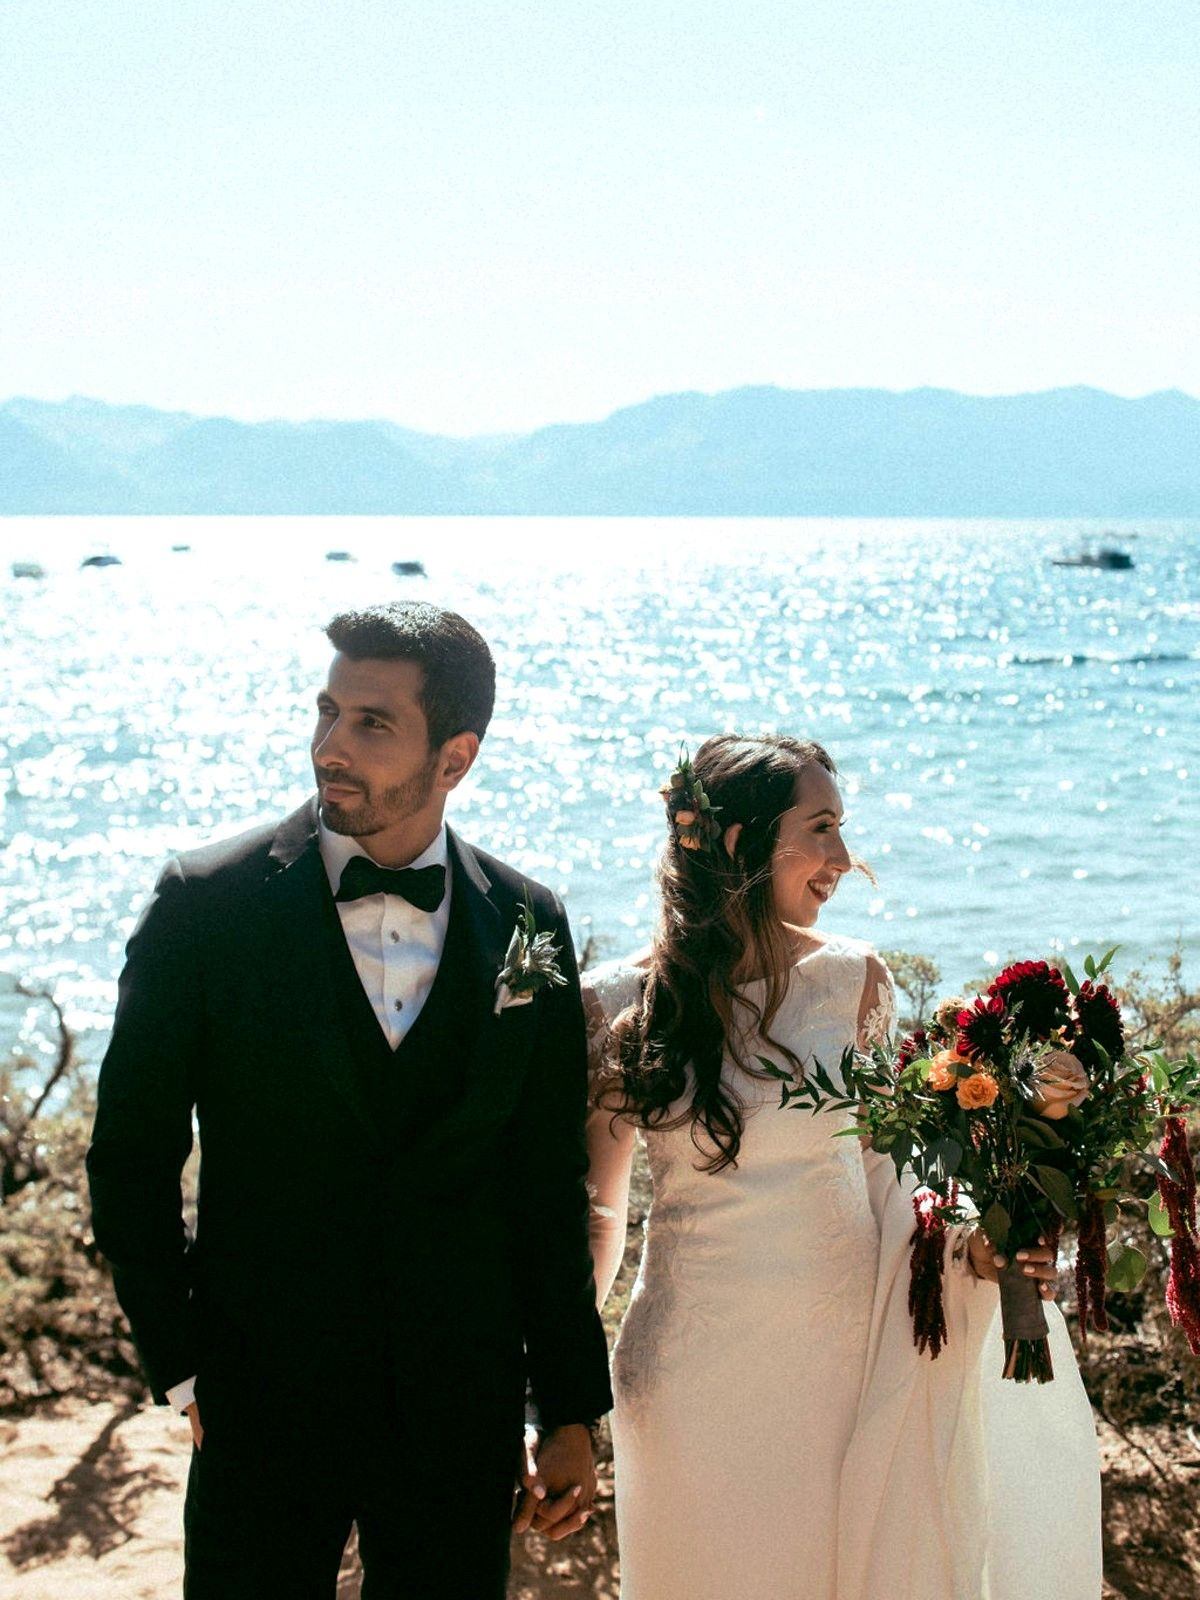 Nancy Rice Artistry - Lake Tahoe wedding hair & makeup - couple by Lake